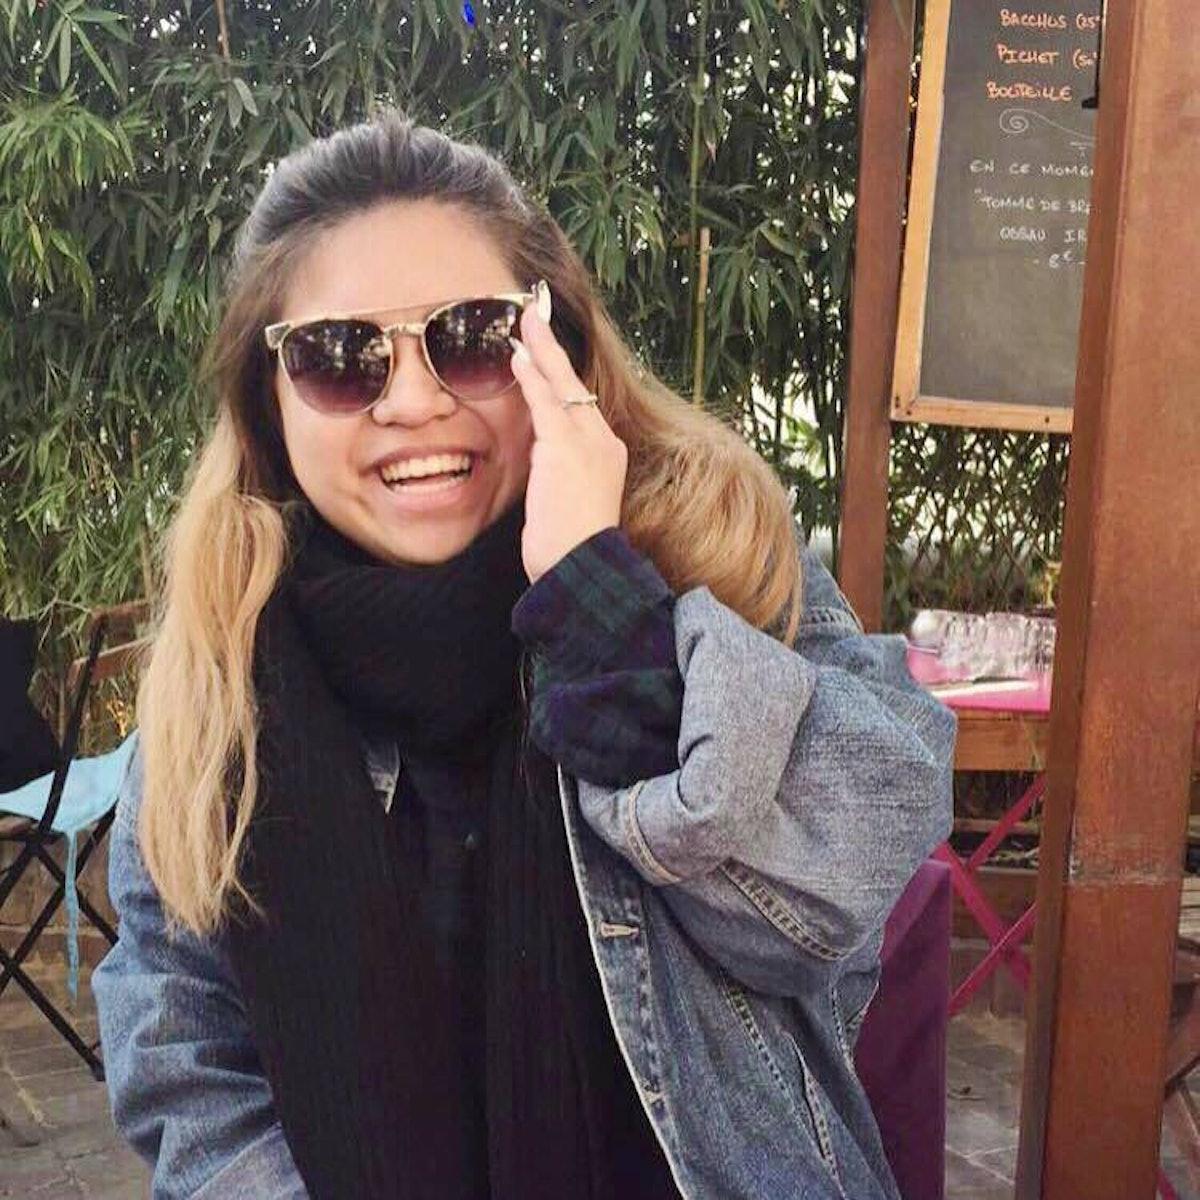 Arielle Lana LeJarde